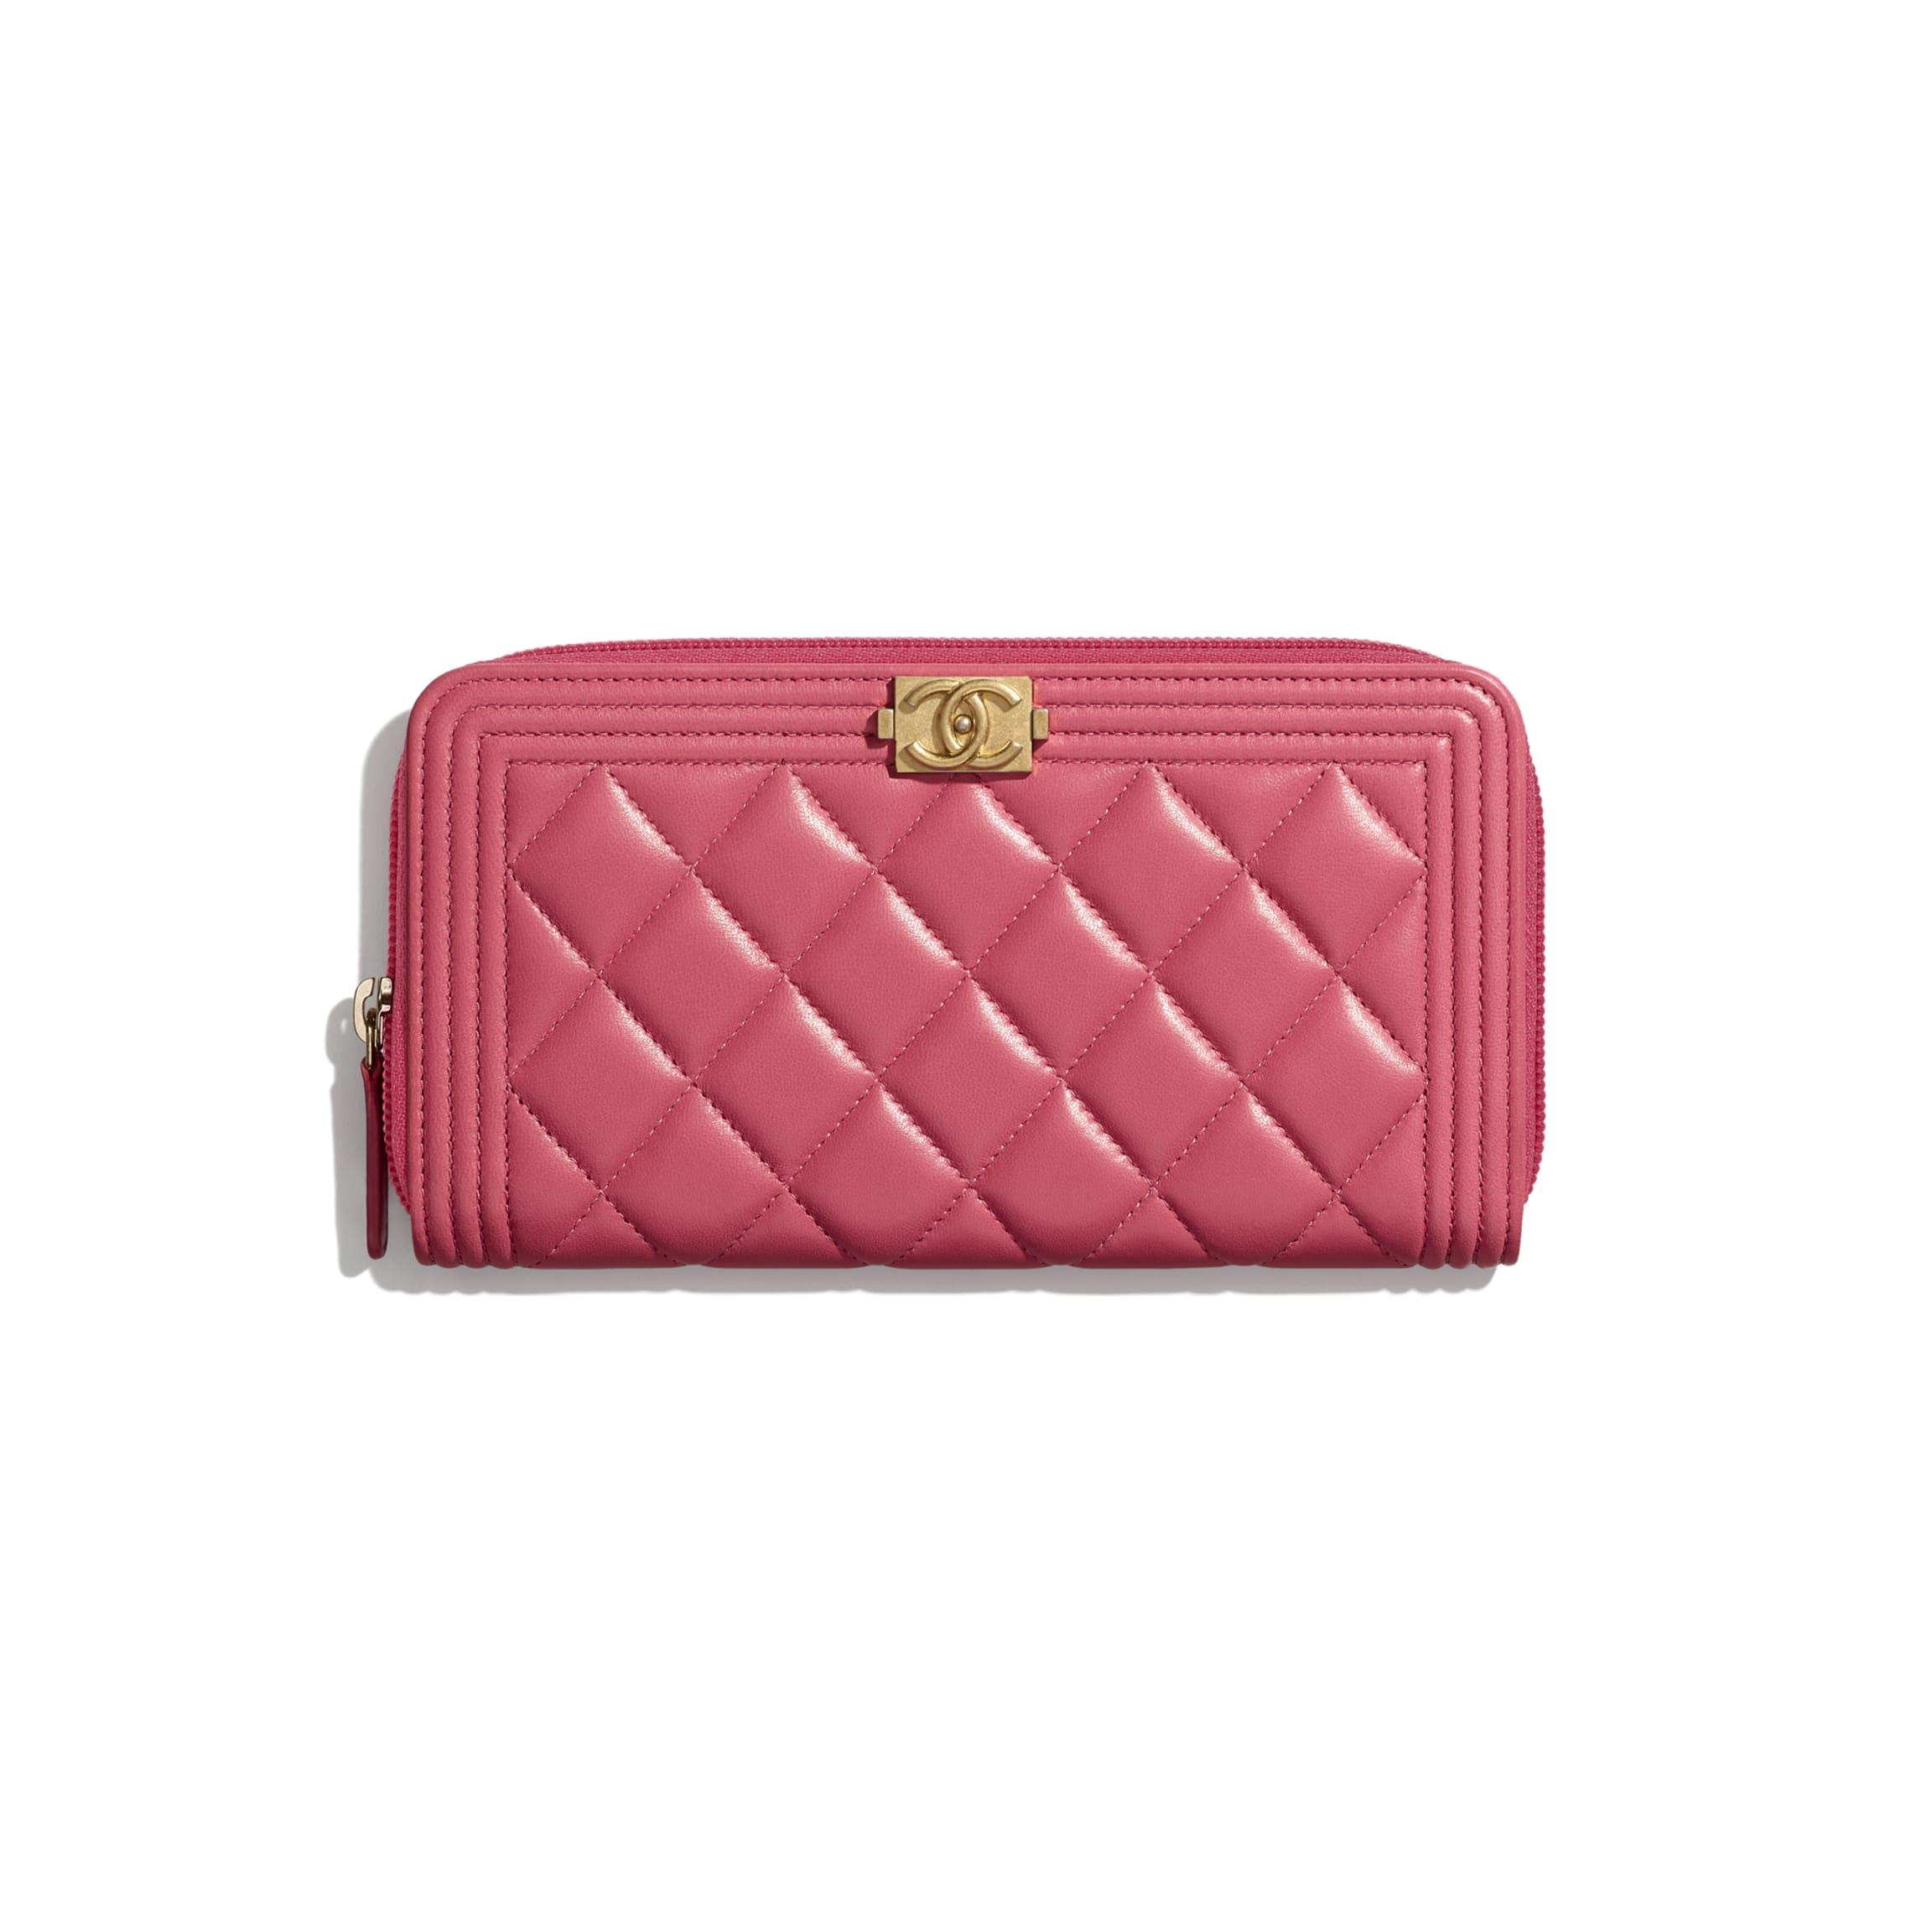 CHANEL BOY CHANEL 拉鏈長銀包 小羊皮及金色金屬 粉紅色 HK$9,000